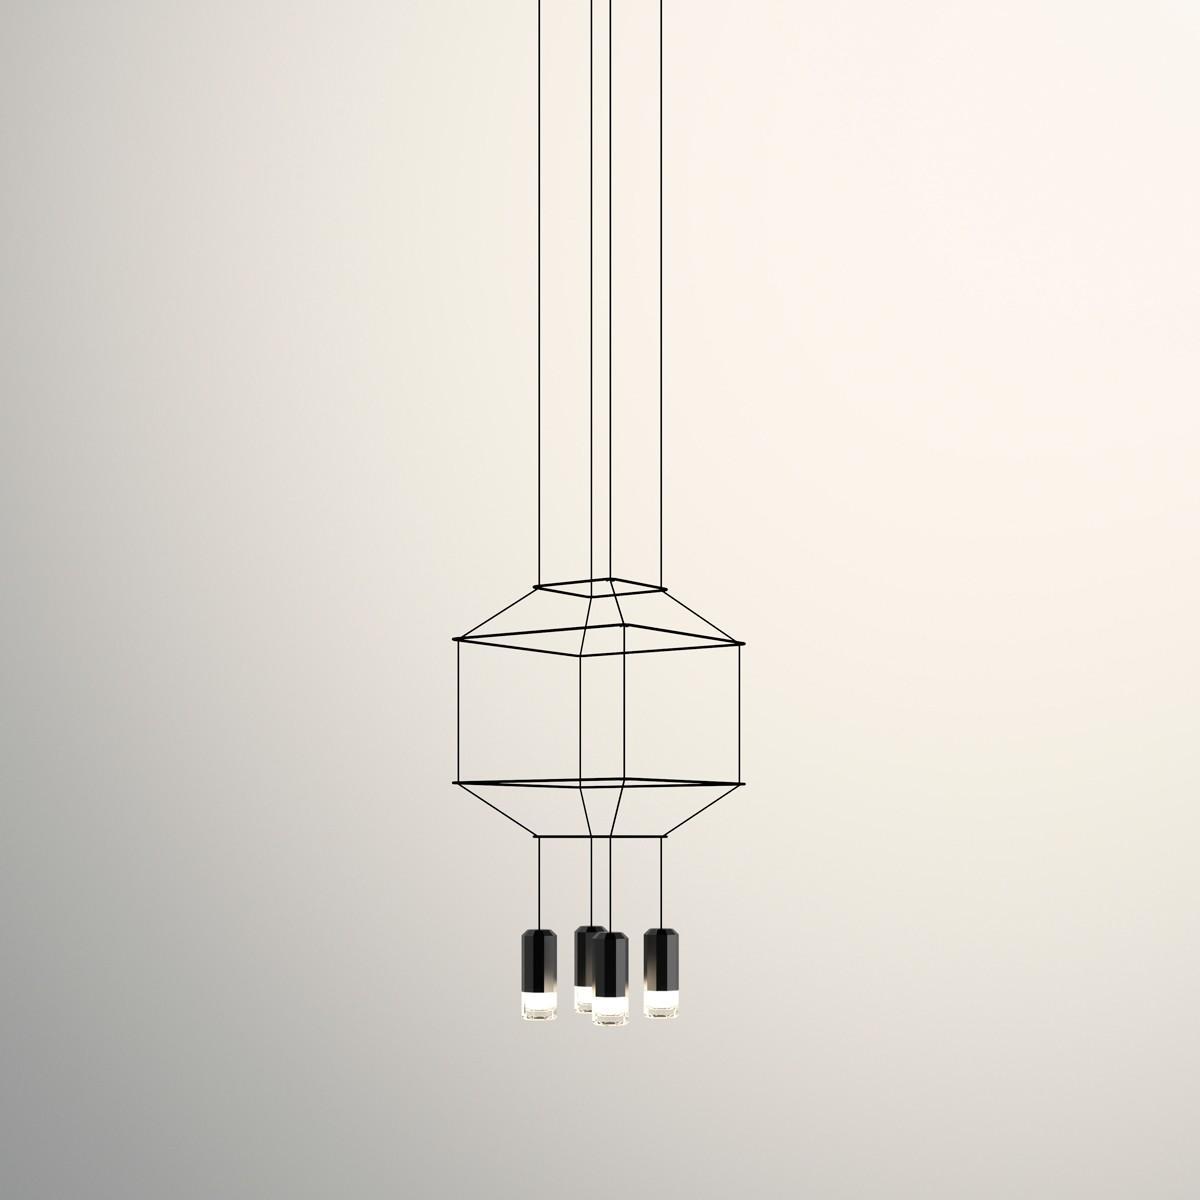 Vibia Wireflow Pendelleuchte, 4-flg., 64 x 64 cm, schwarz